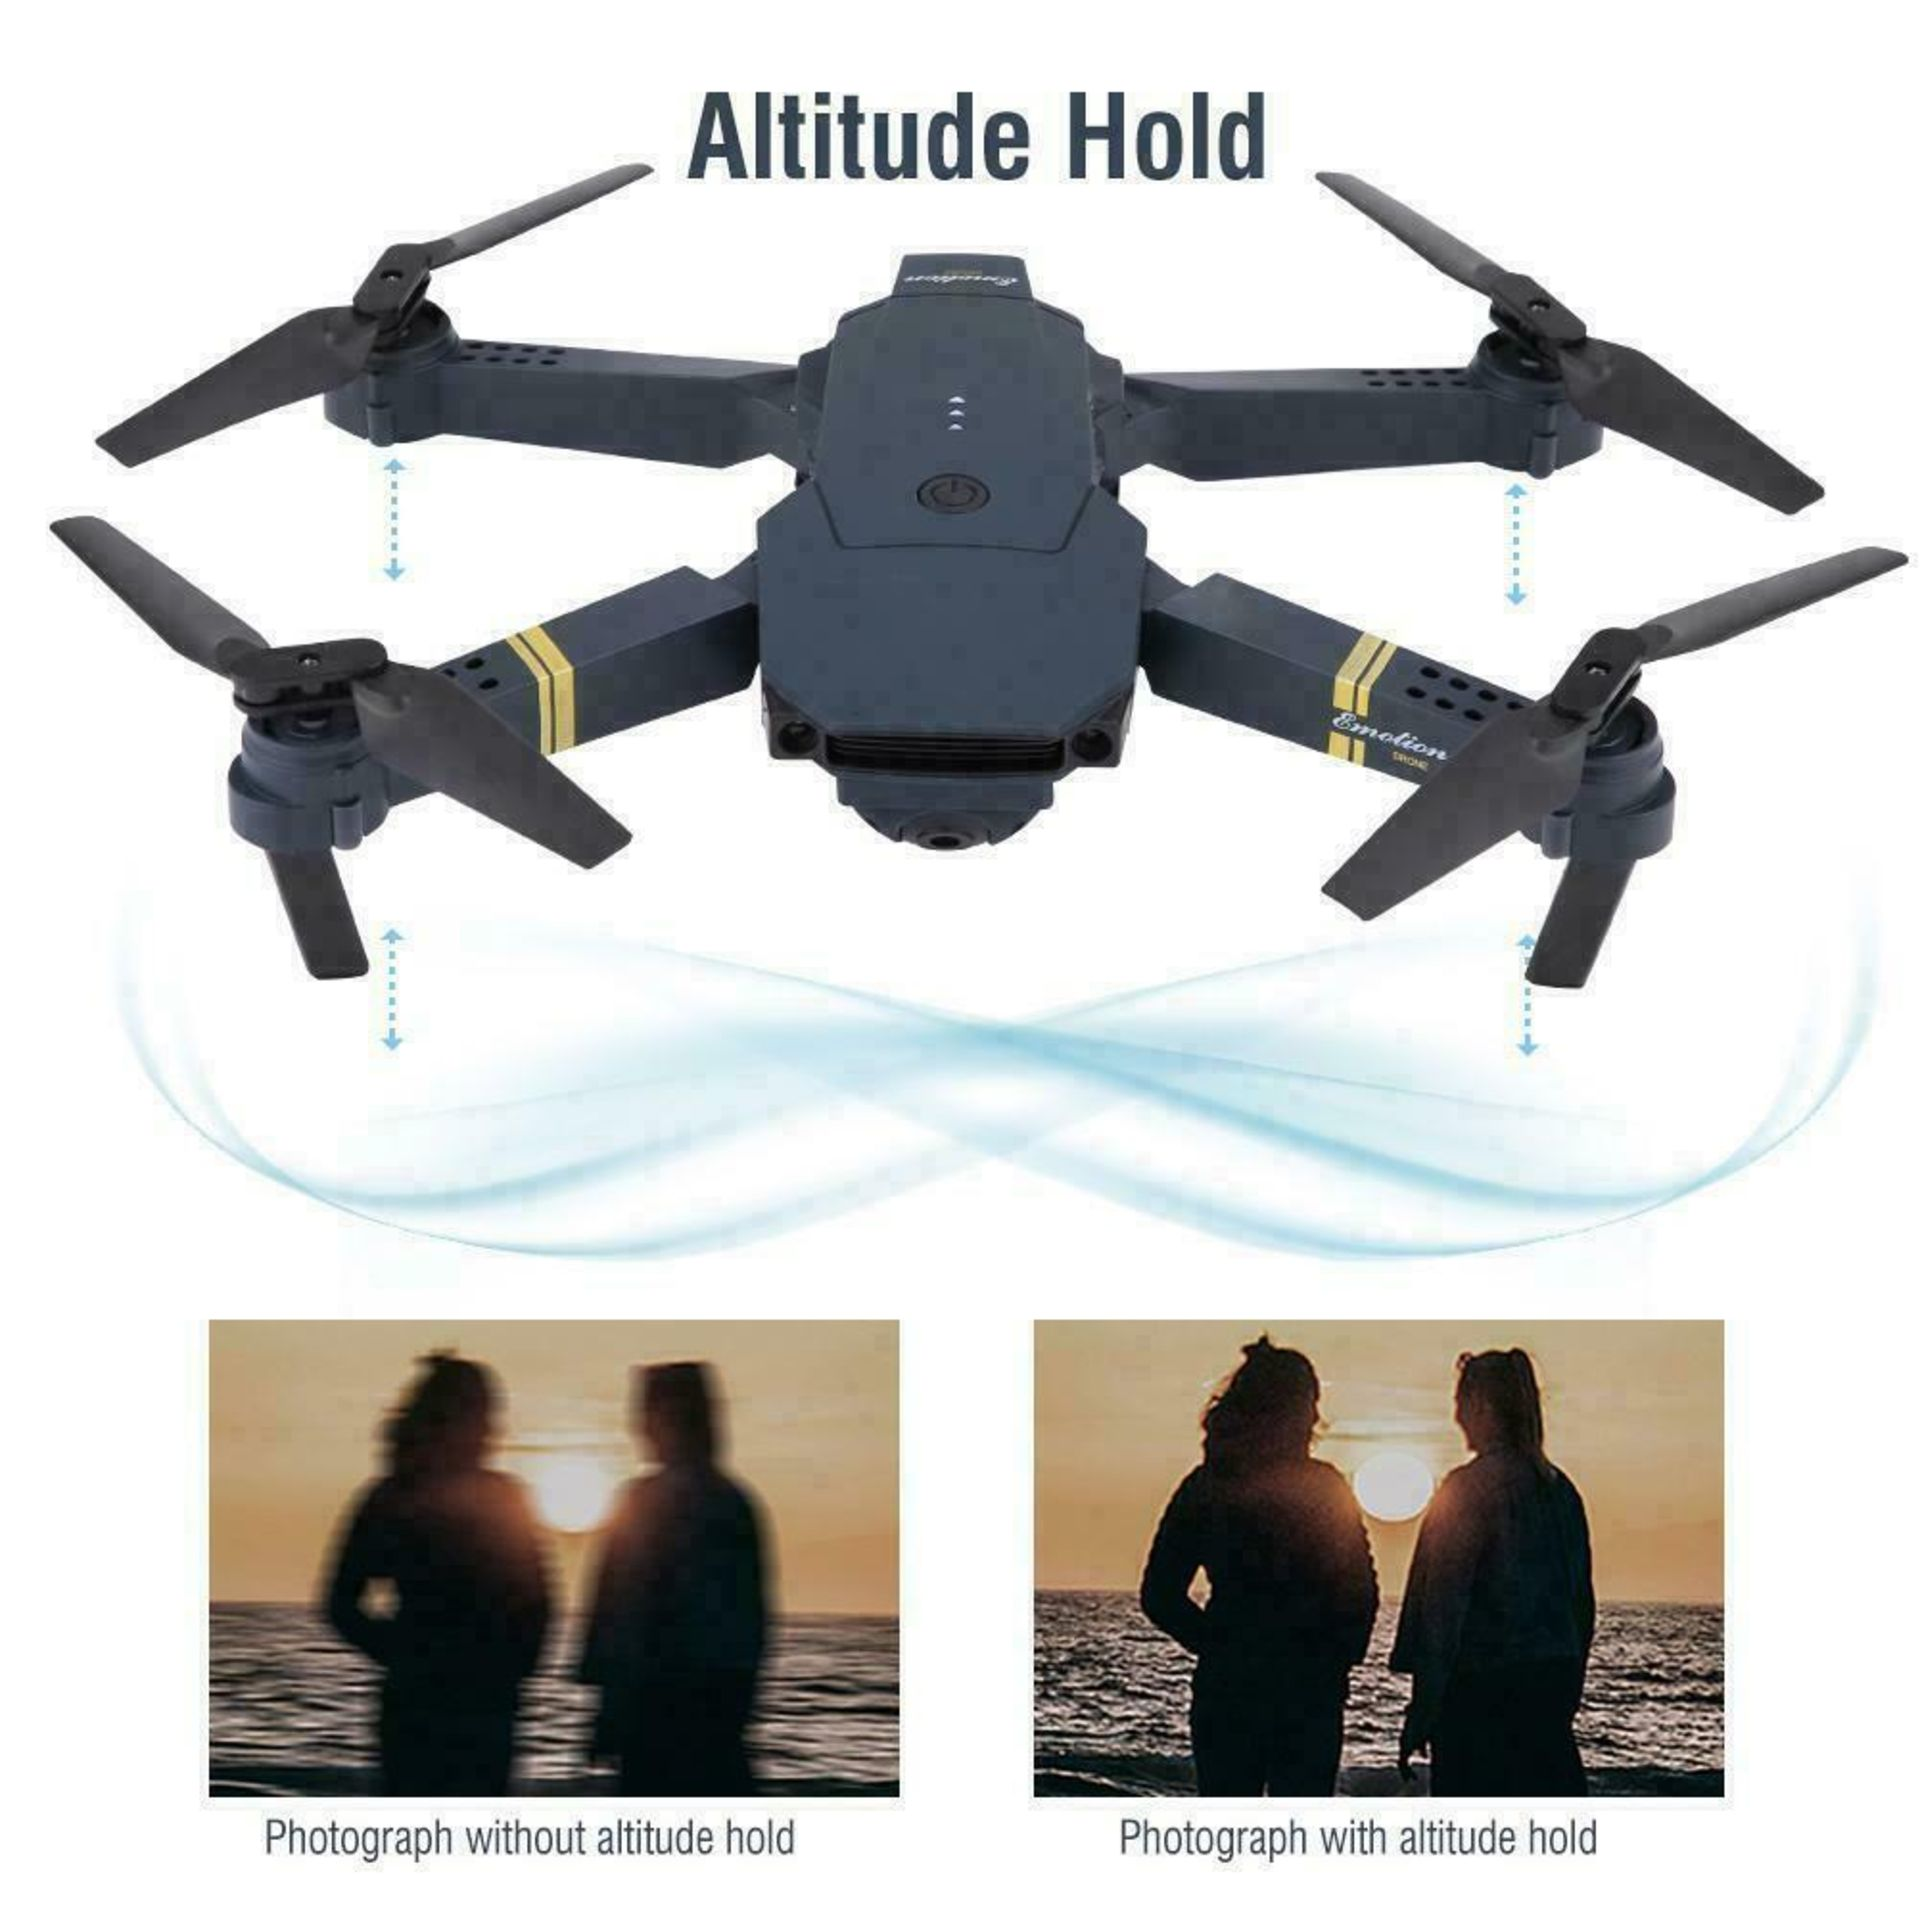 NEW & UNUSED DRONE X PRO WIFI FPV 1080P HD CAMERA FOLDABLE RC QUADCOPTER + BAG *PLUS VAT* - Image 6 of 9